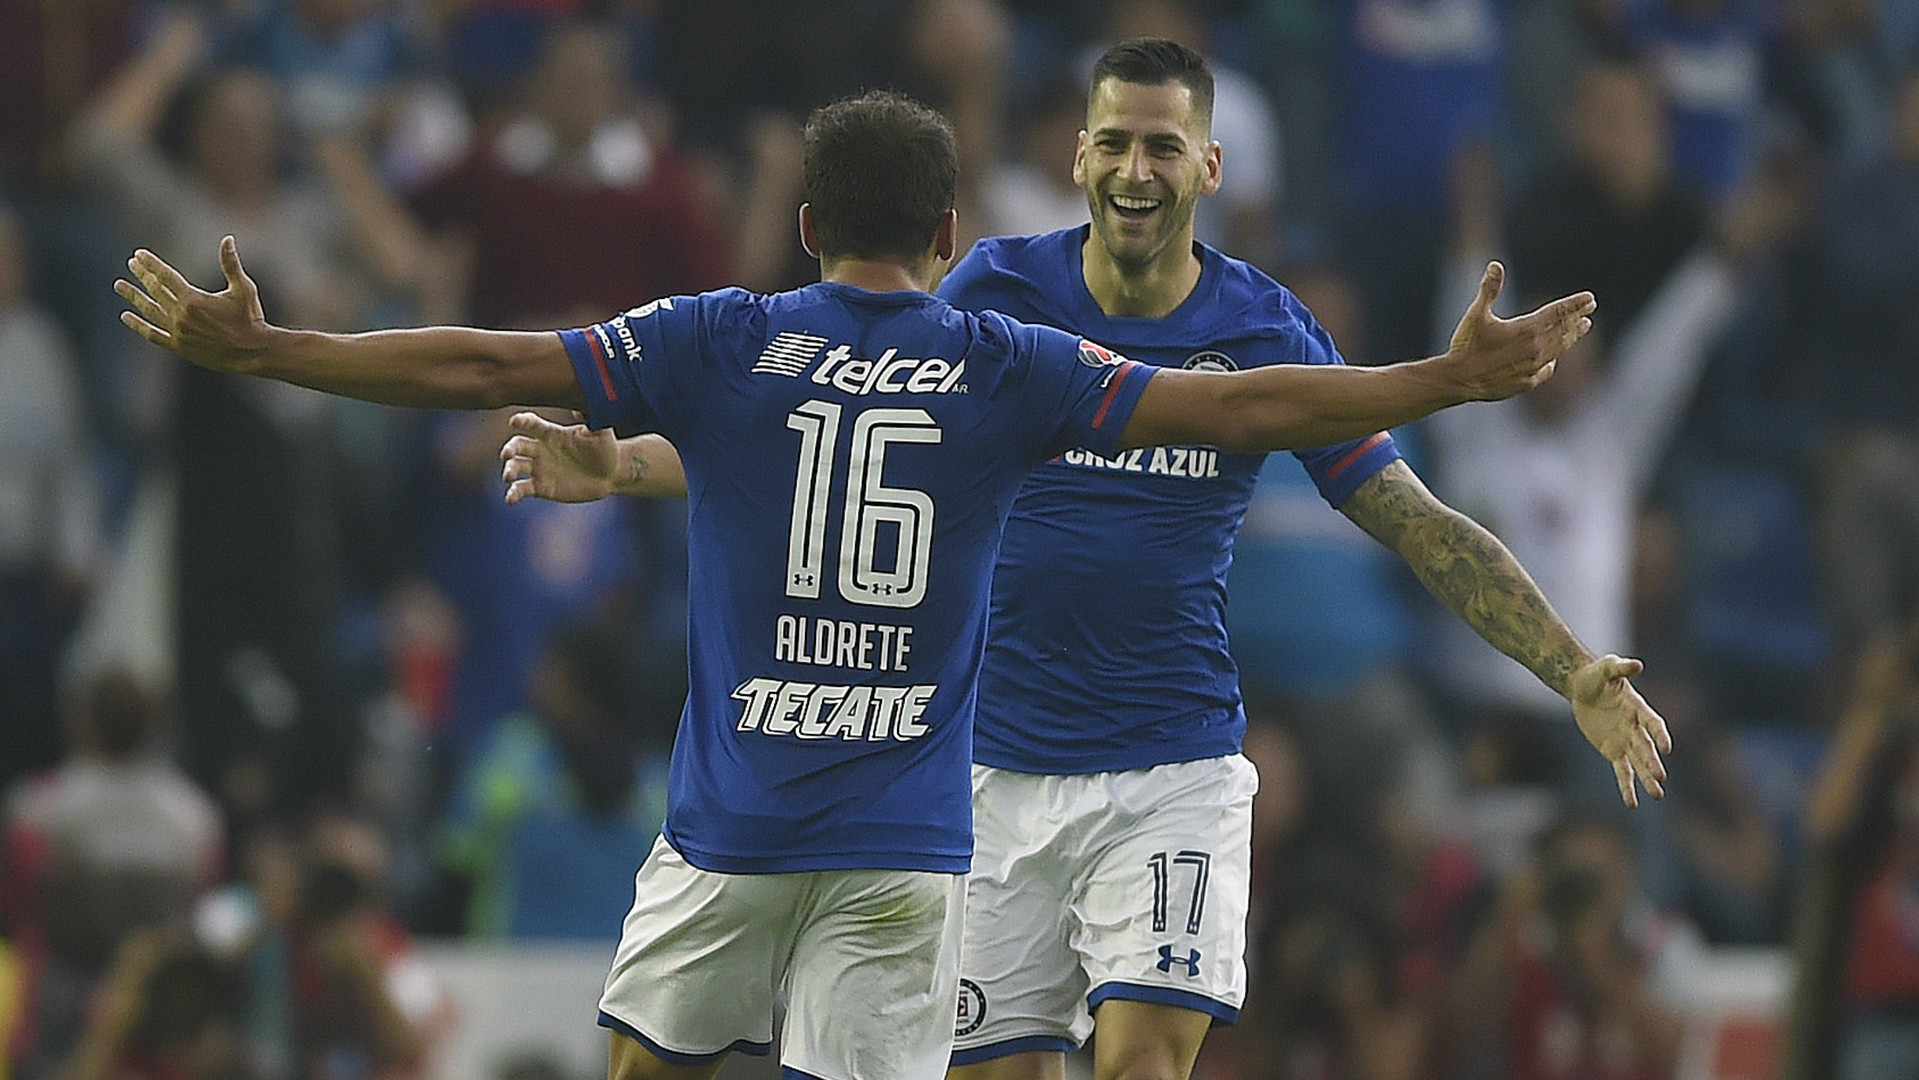 Adrian Aldrete Edgar Cruz Azul